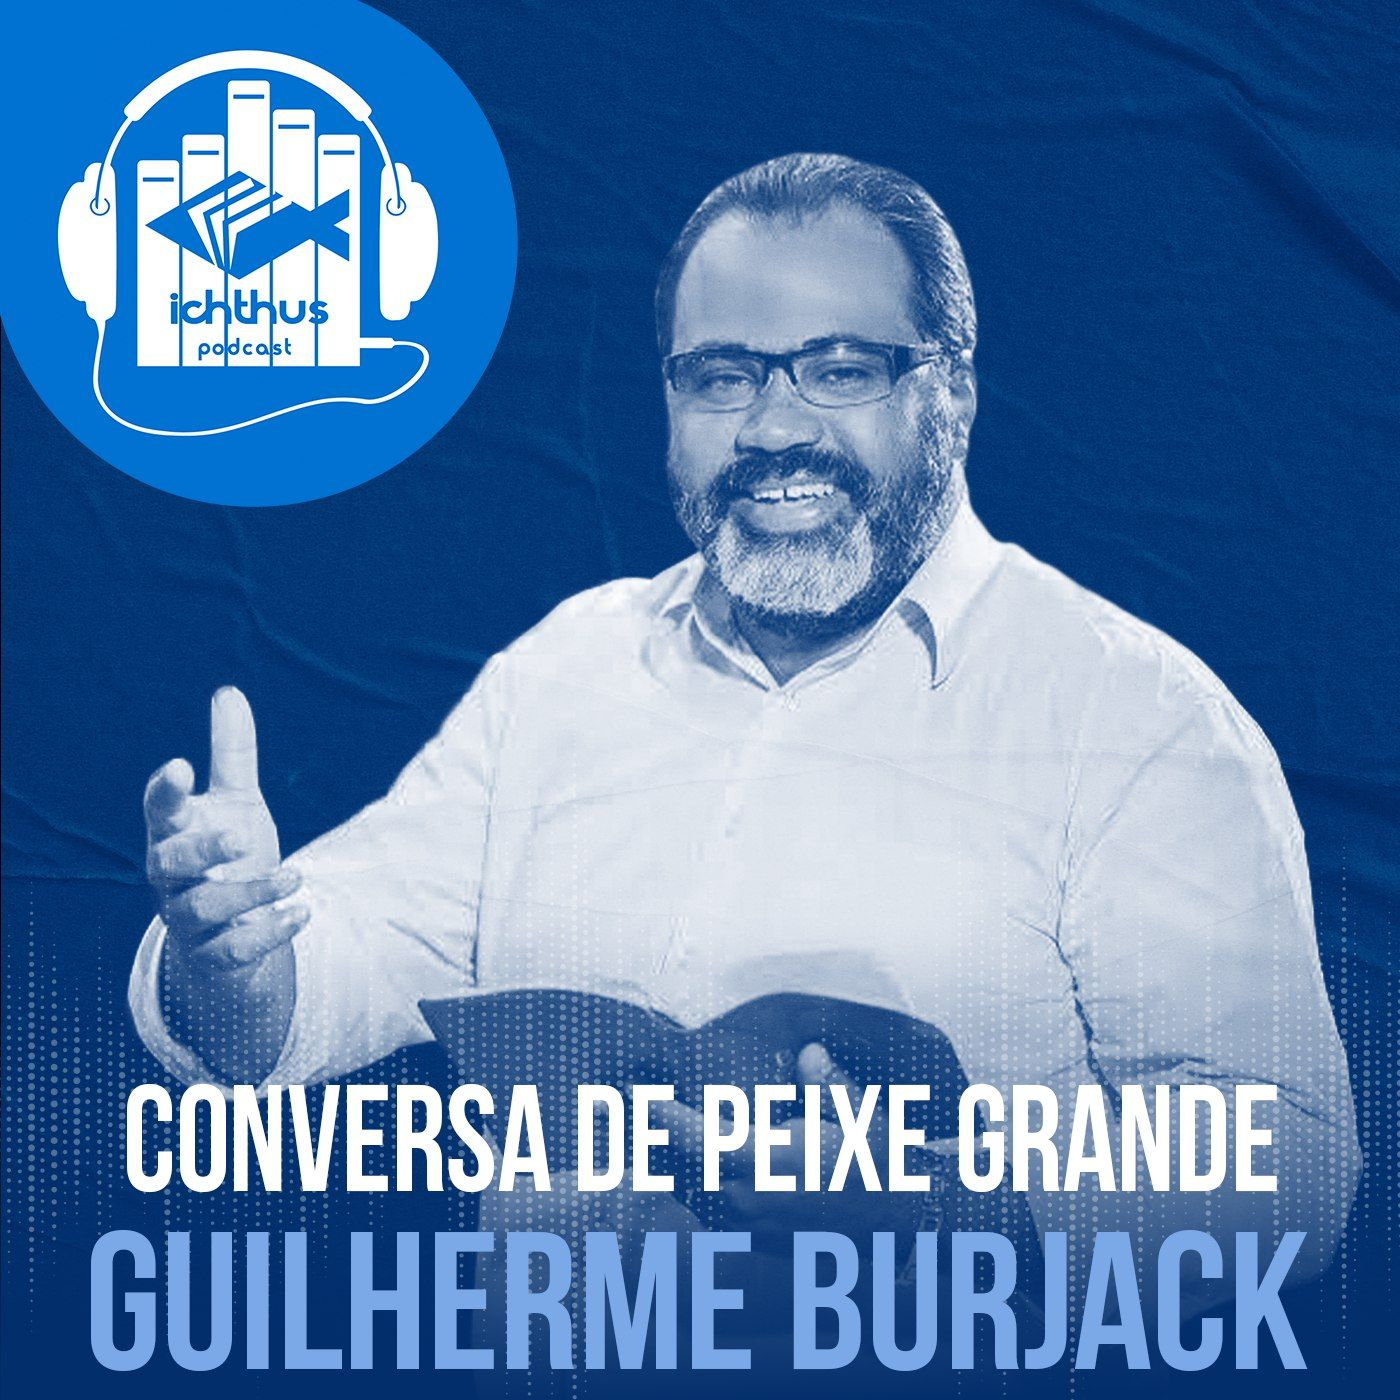 Guilherme Burjack | Conversa de peixe grande